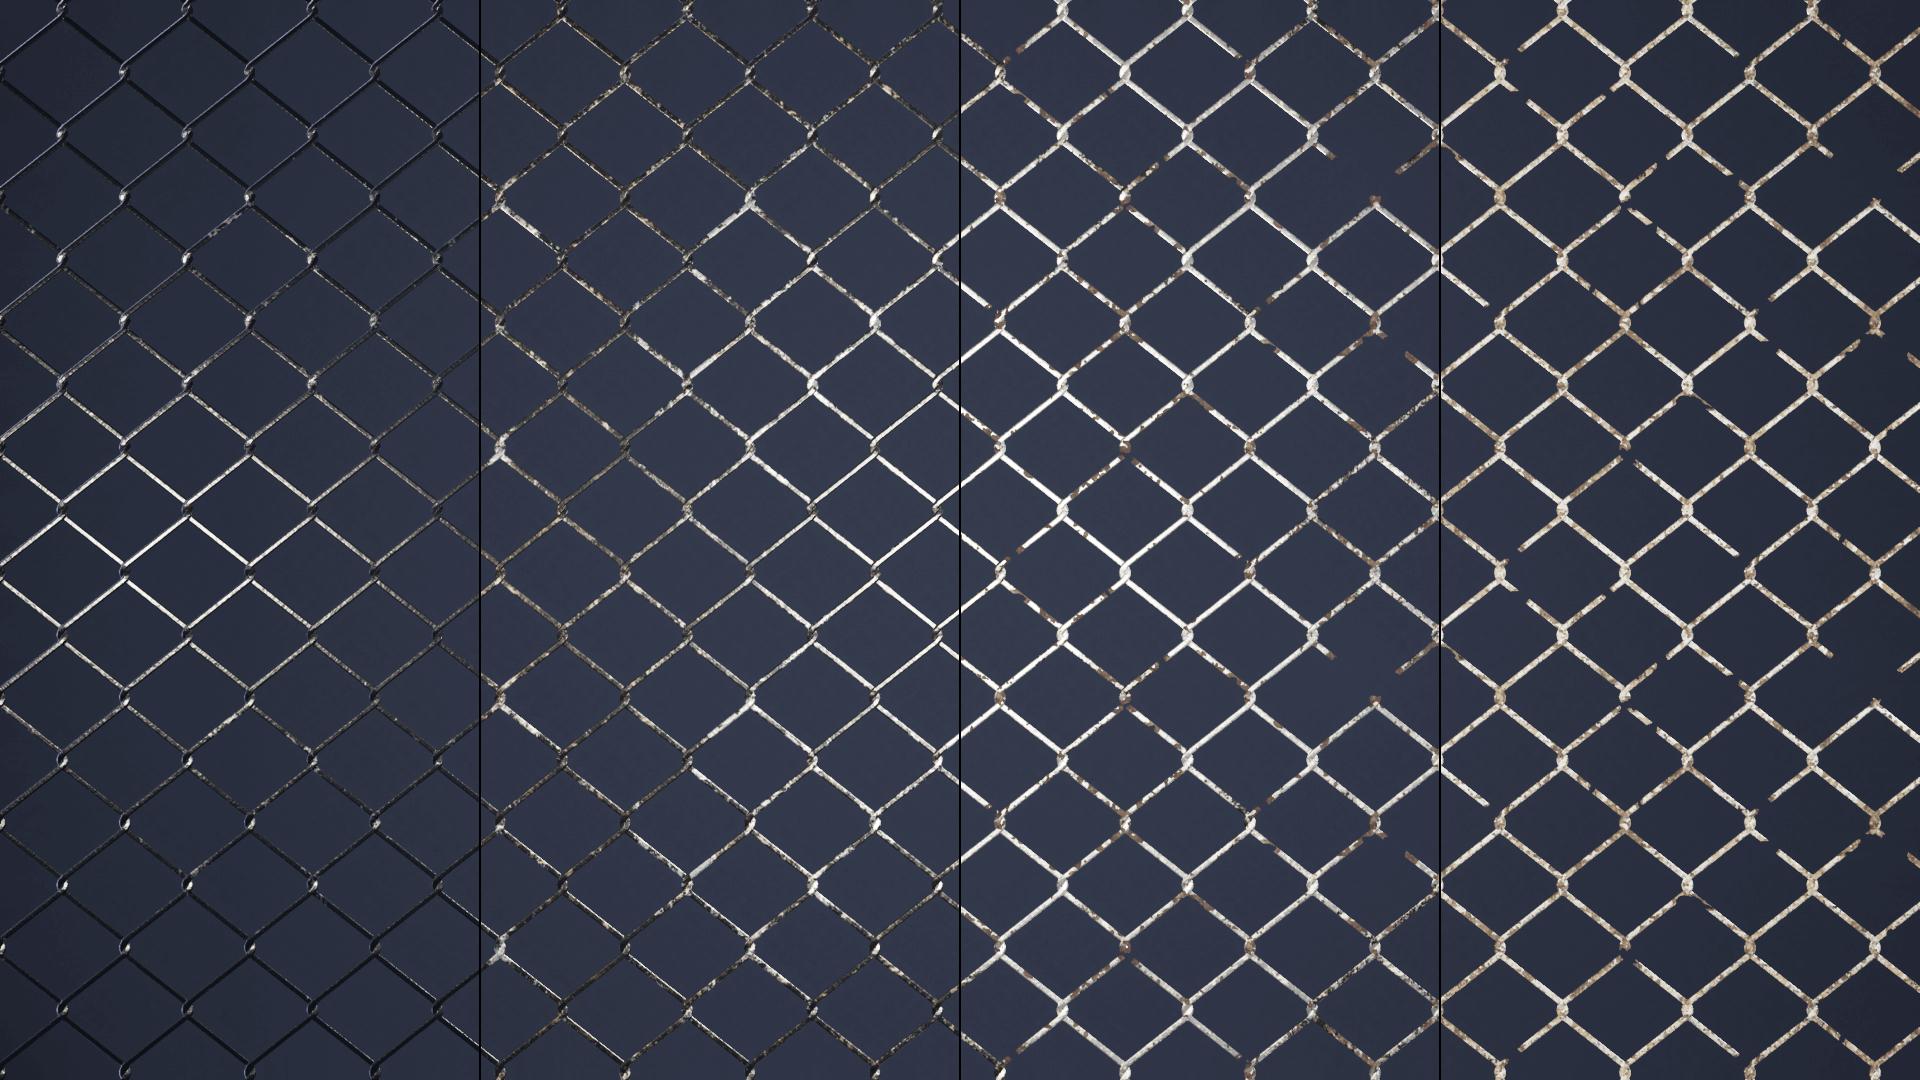 Metal Materials - Cutouts by David Zygmunt in Materials - UE4